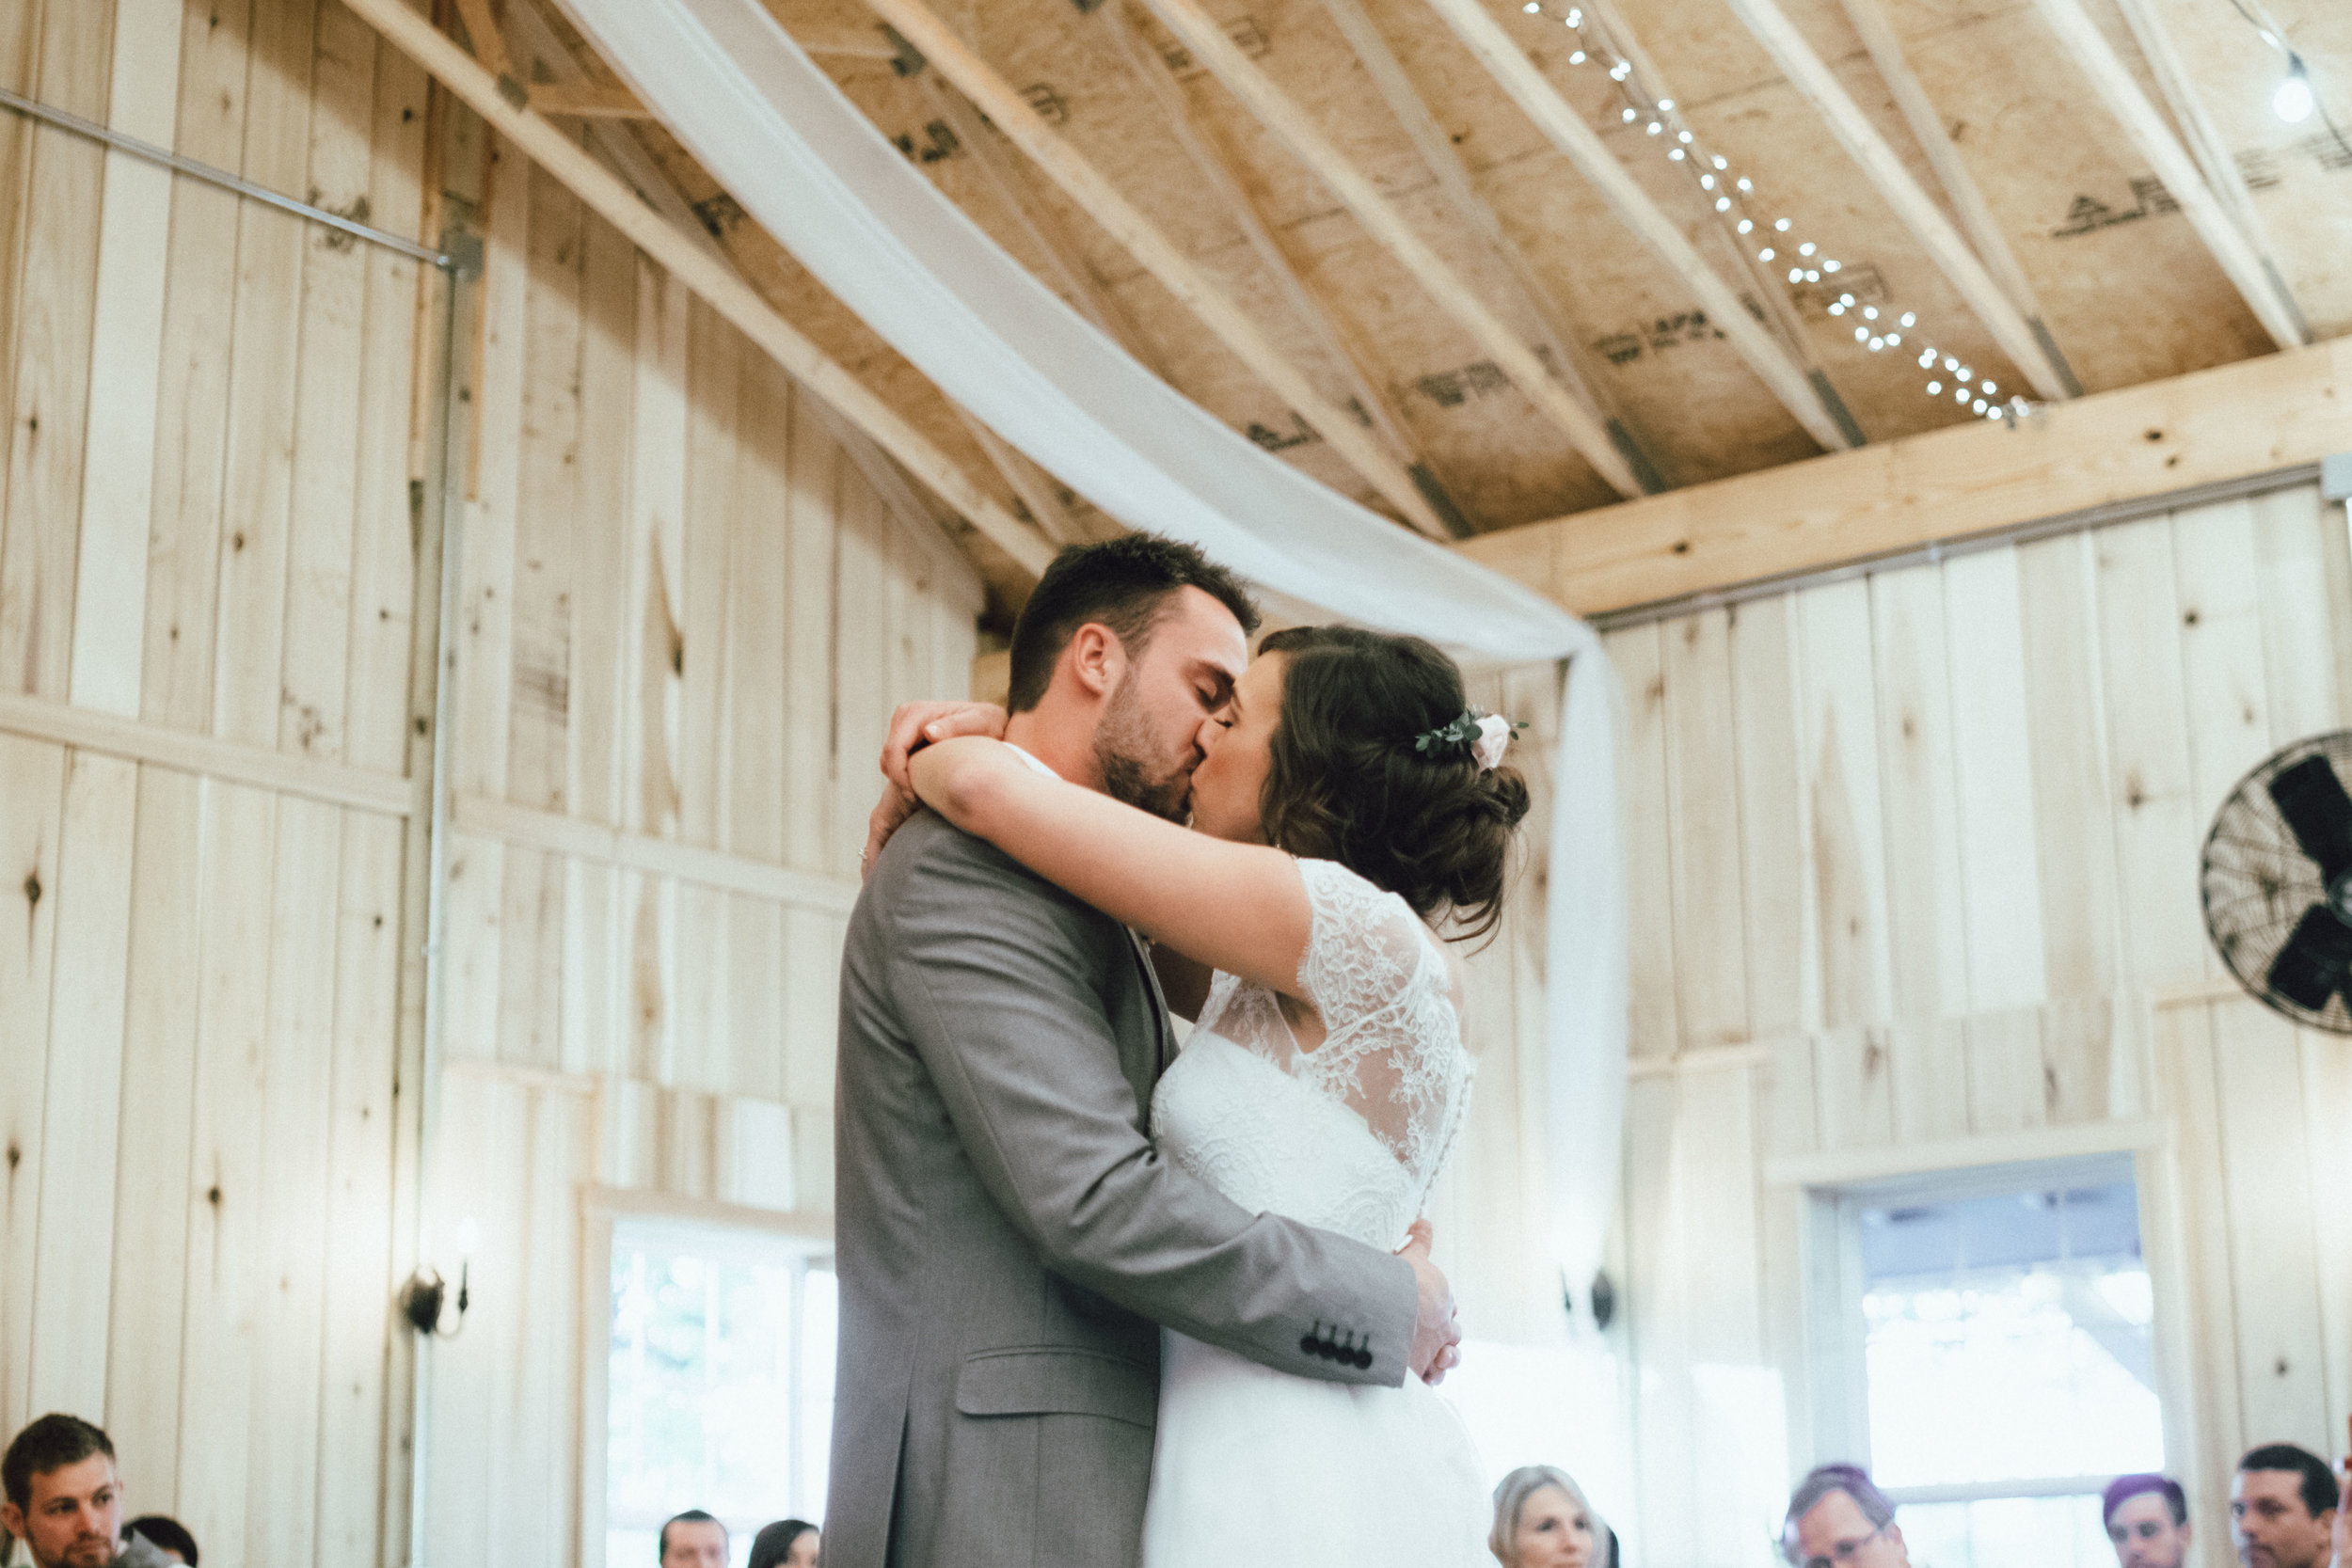 Steph-Ben-Blog-Indianapolis-Wedding-70.jpg